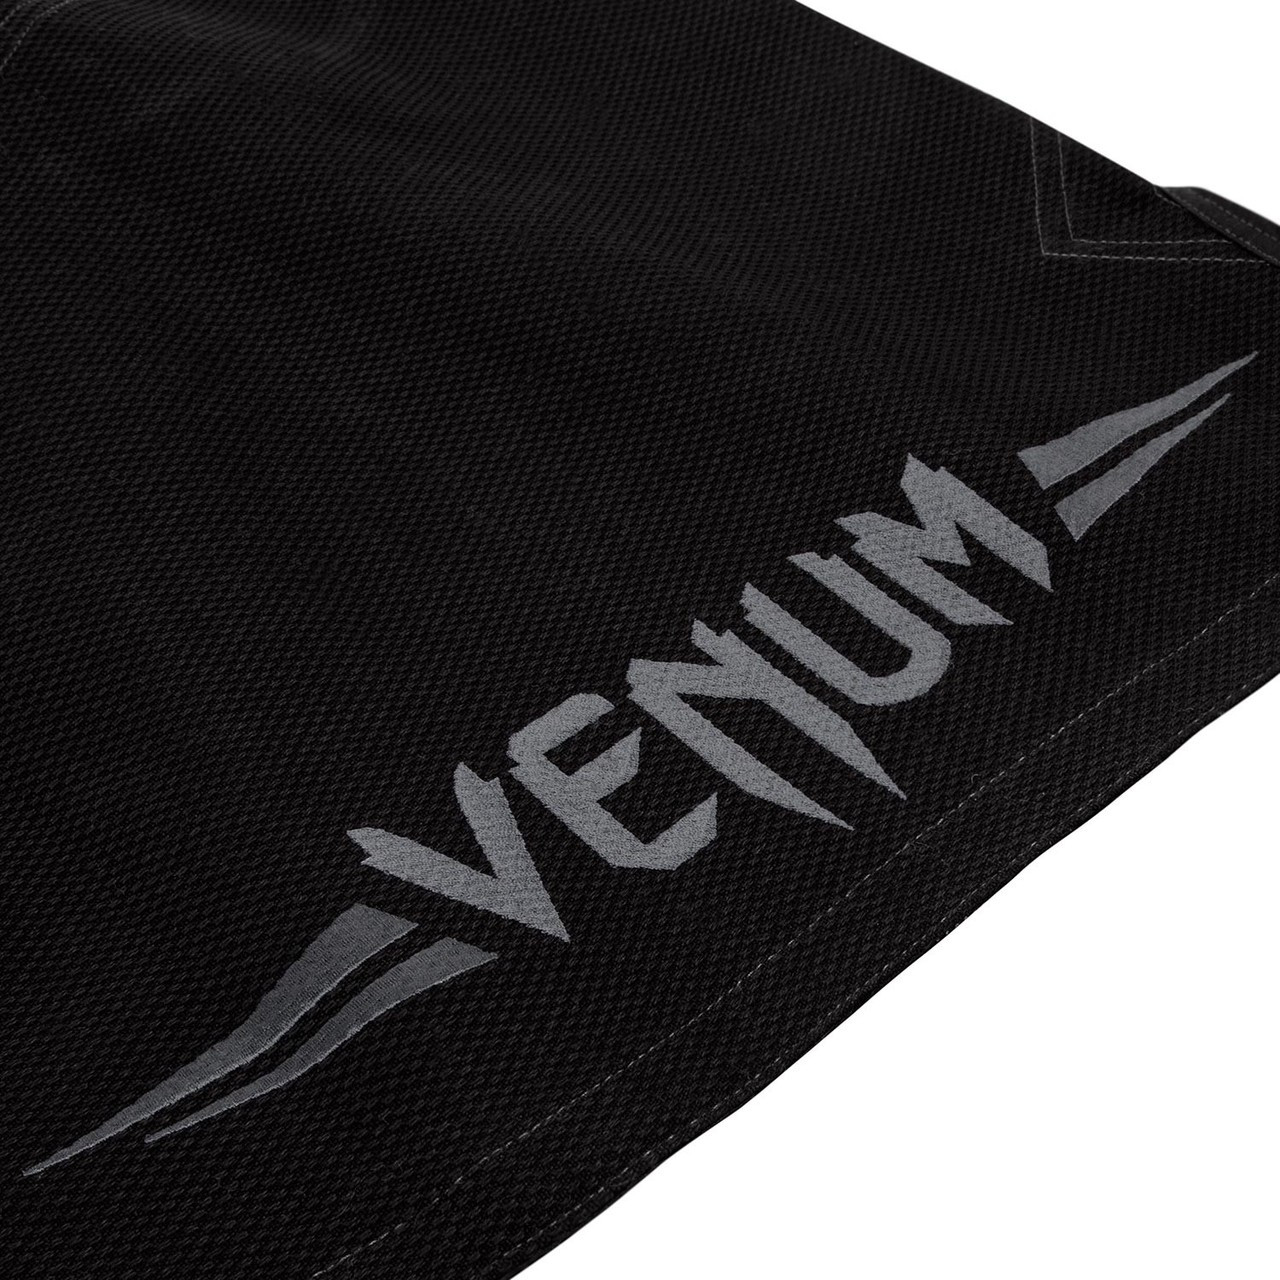 Botton back of the gi Venum Elite BJJ GI in Black on black  is now available at www.thejiujitsushop.com  Enjoy Free Shipping from The Jiu Jitsu Shop today!